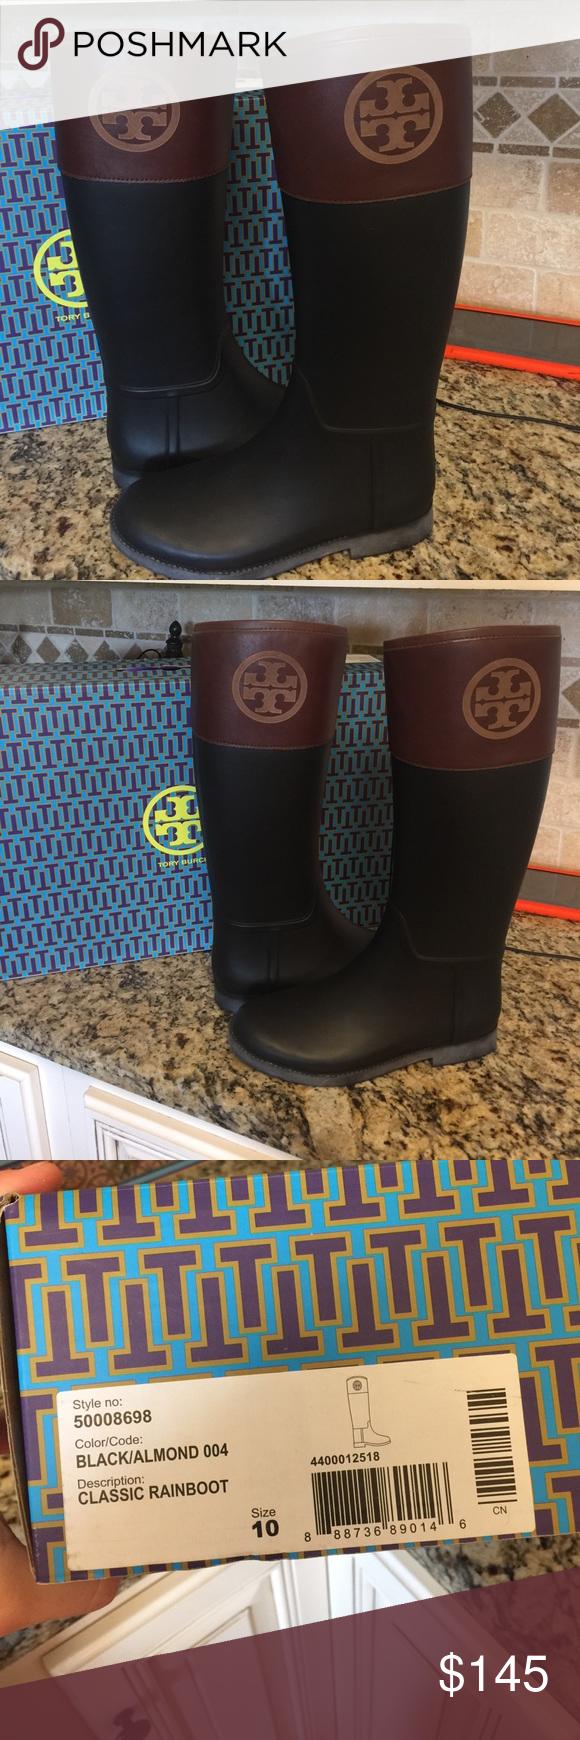 3b456edfd84 🎉🎉Tory Burch rain boots size 10 New in box🎉🎉 Gorgeous!!! I tried ...